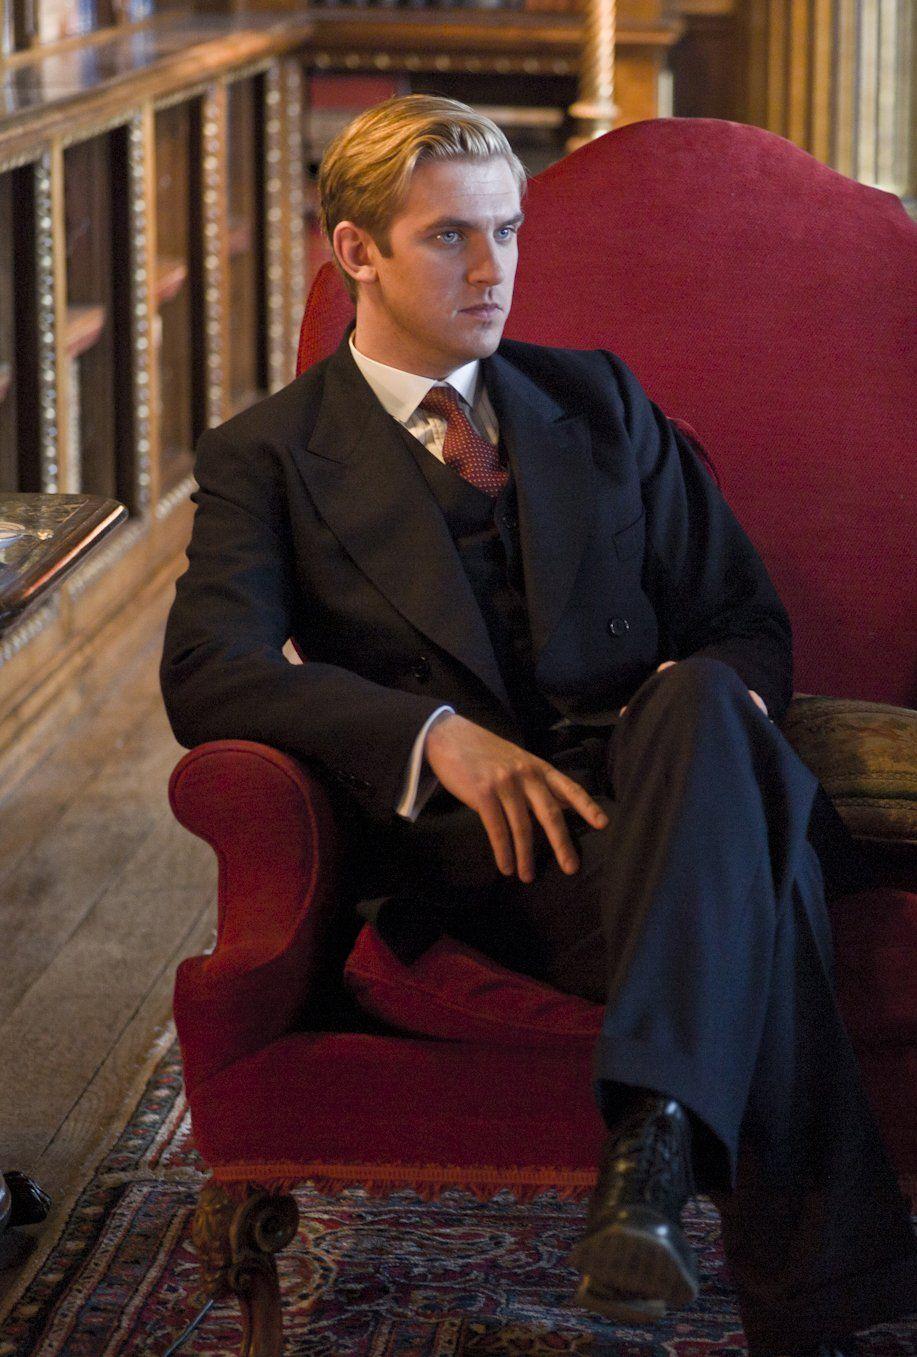 Downton Abbey - Matthew Crawley